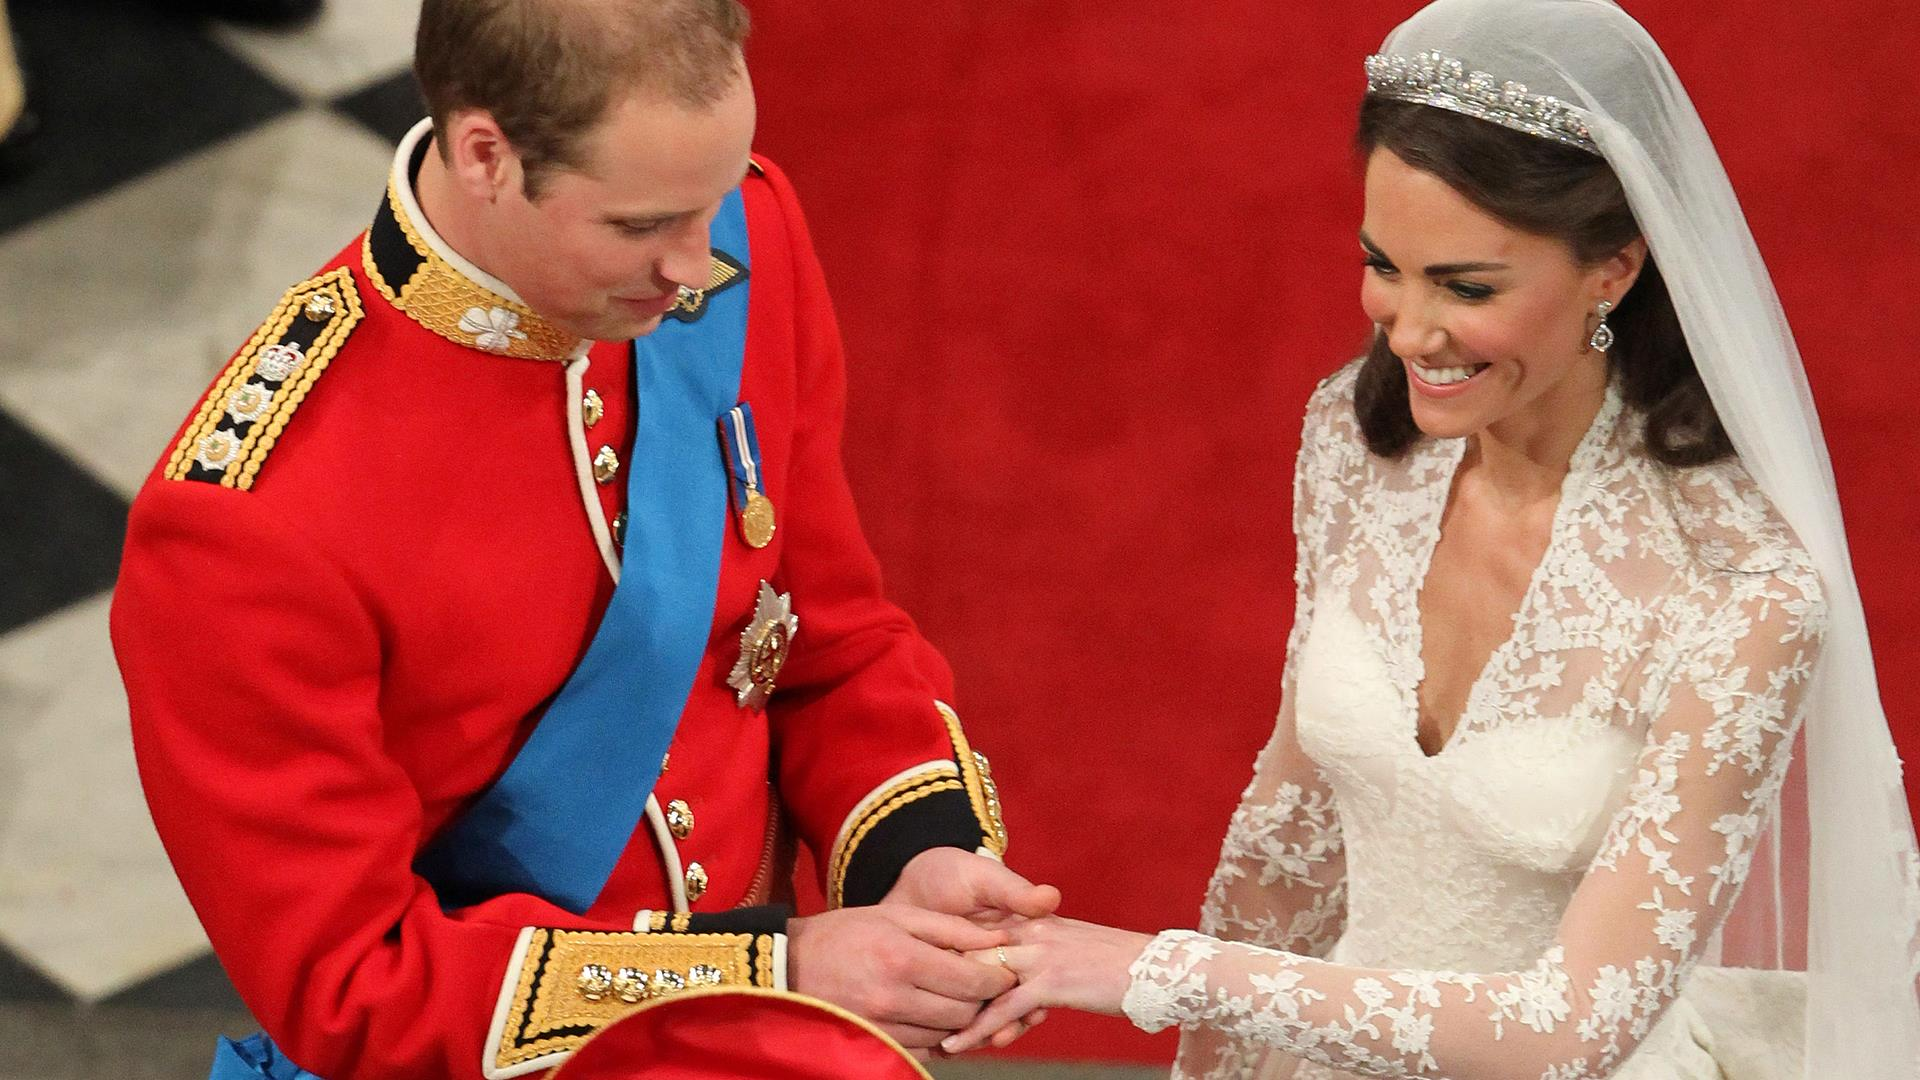 Prince William Wedding.Flashback Prince William And Duchess Kate S Royal Wedding